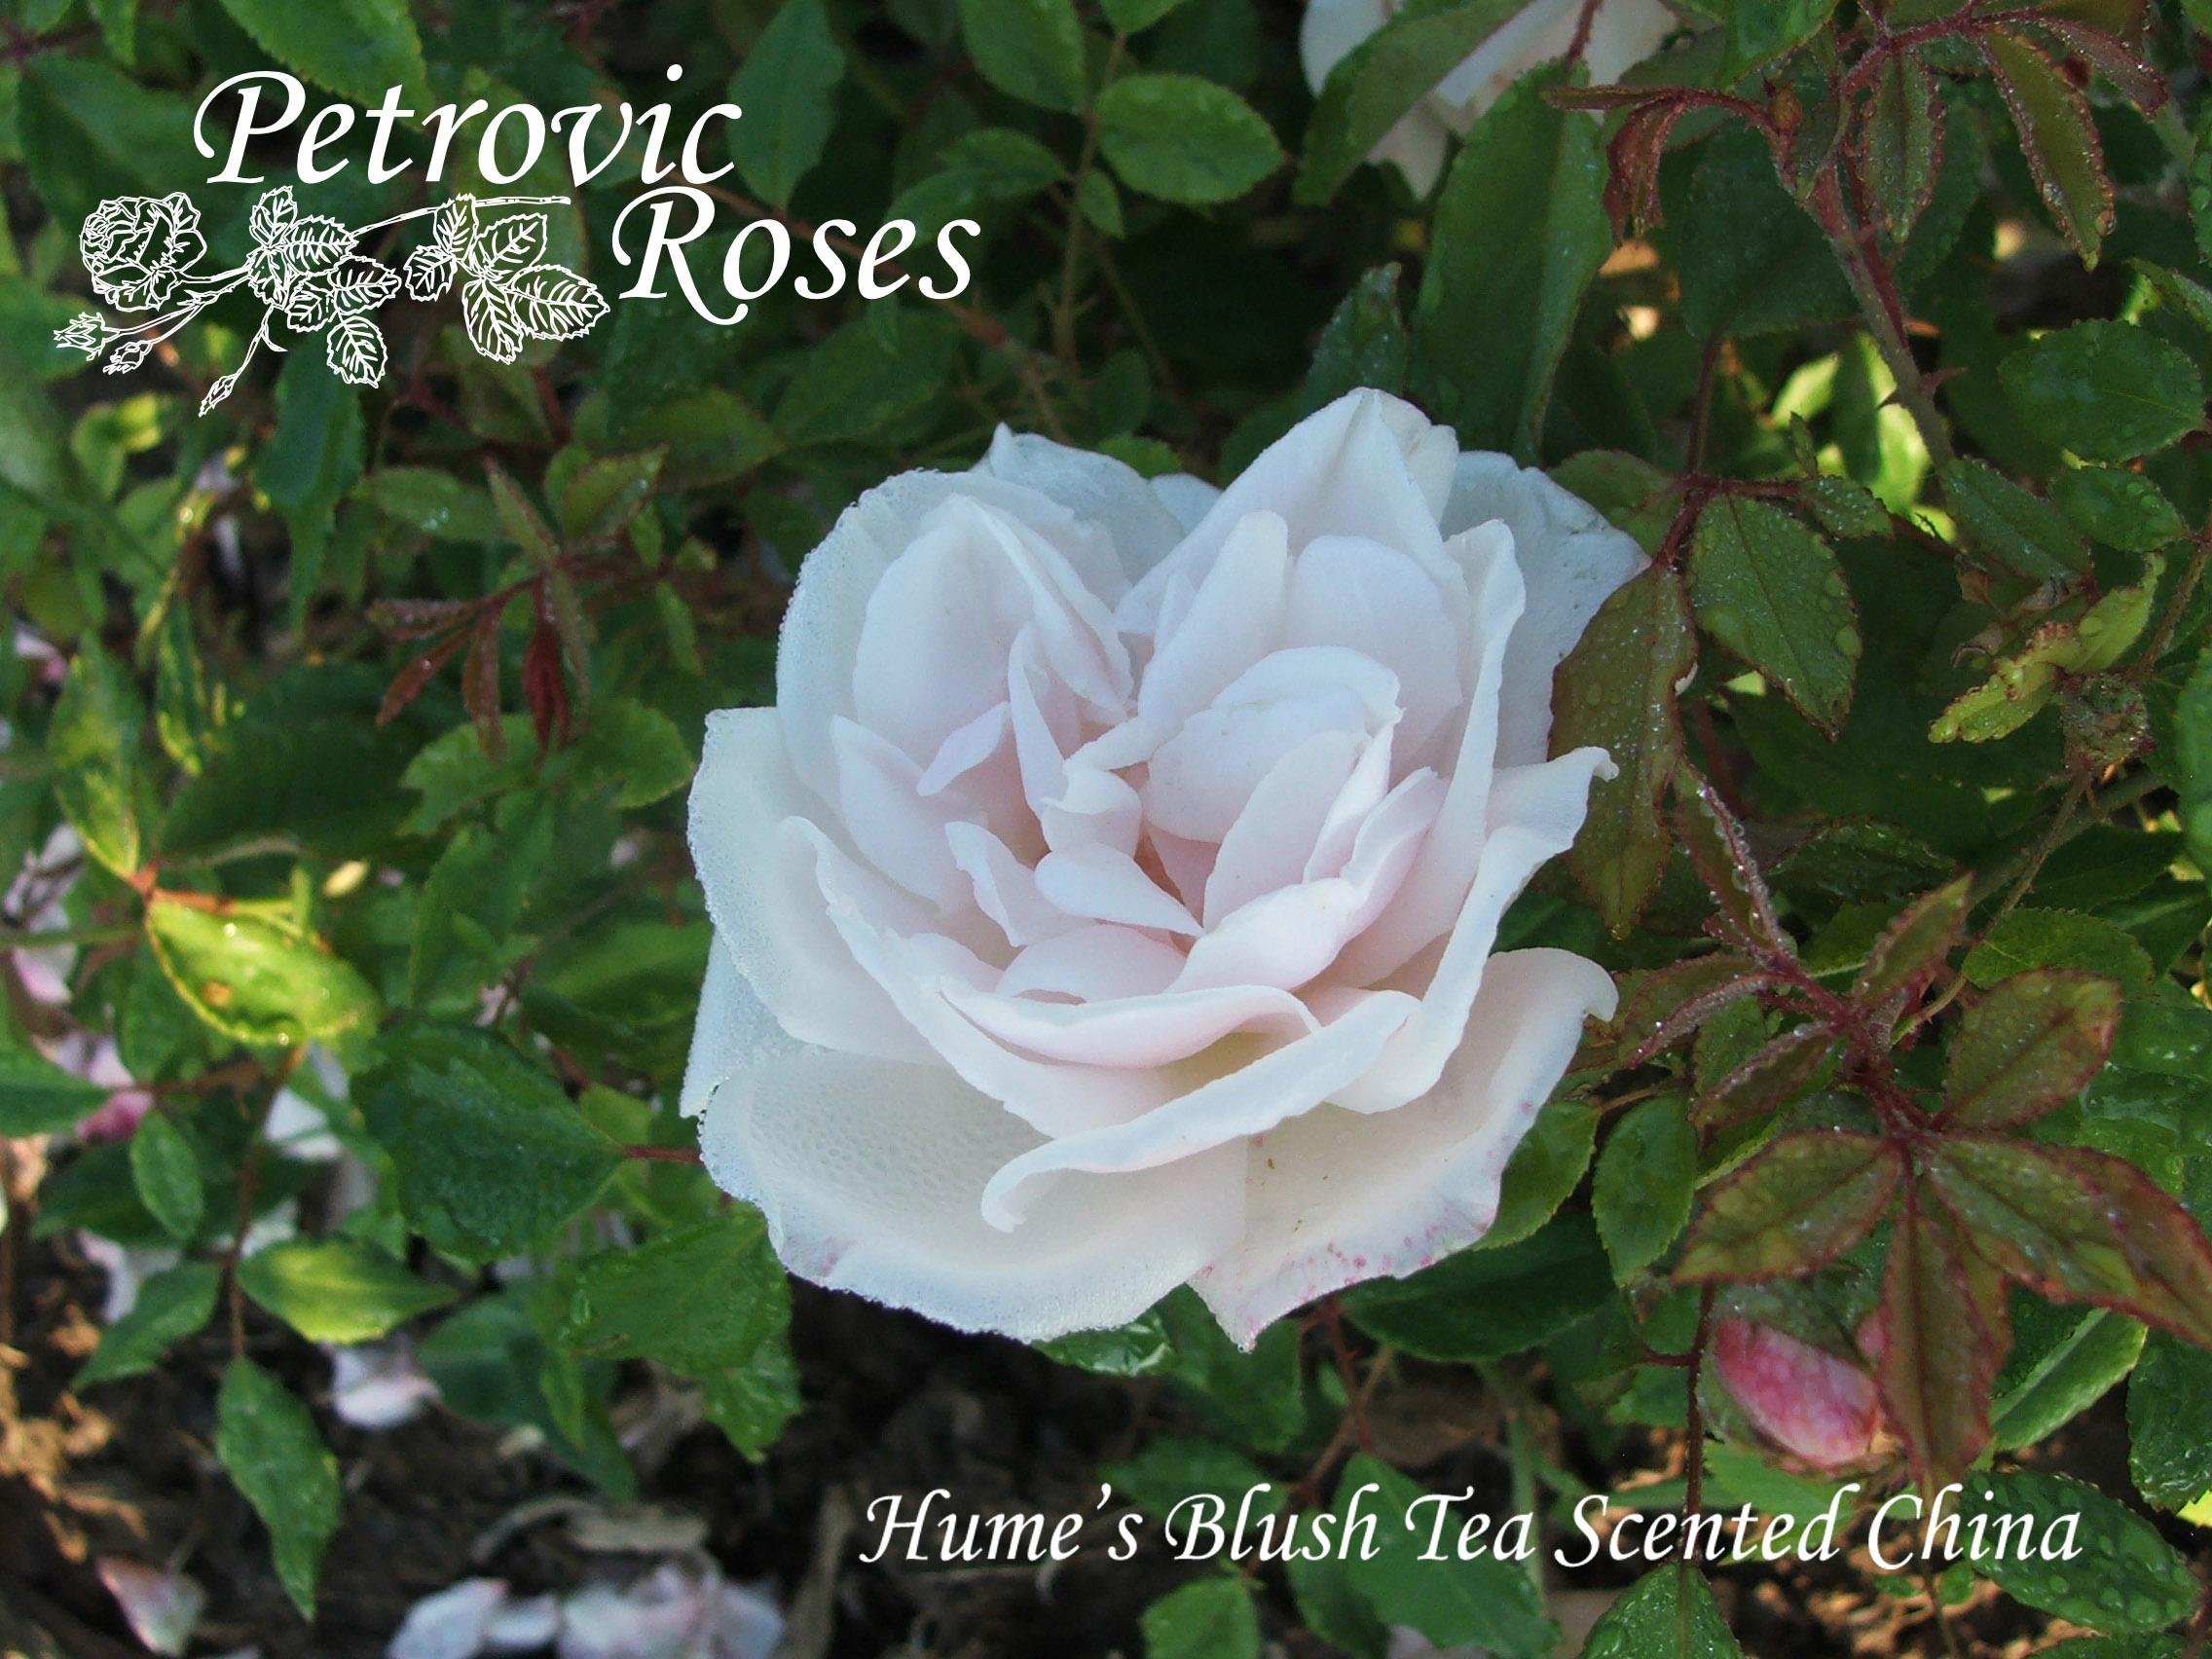 hume s blush tea scented china petrovic roses